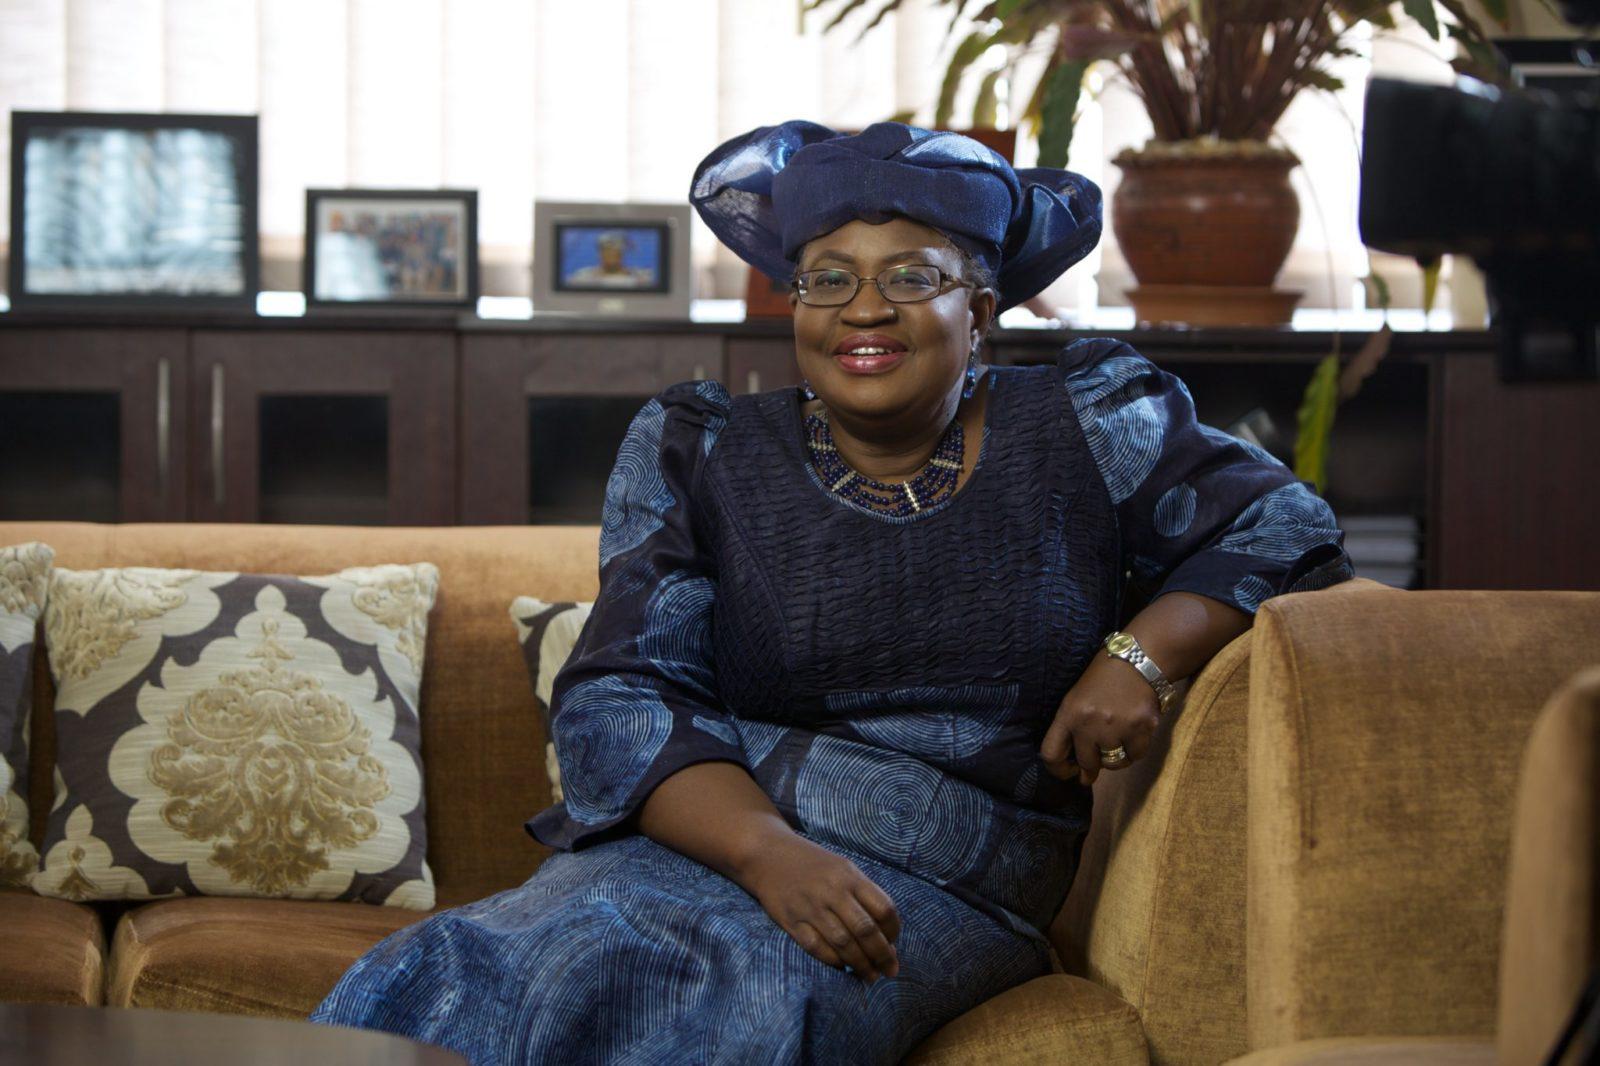 The accidental economist: Dr. NGOZI OKONJO-IWEALA